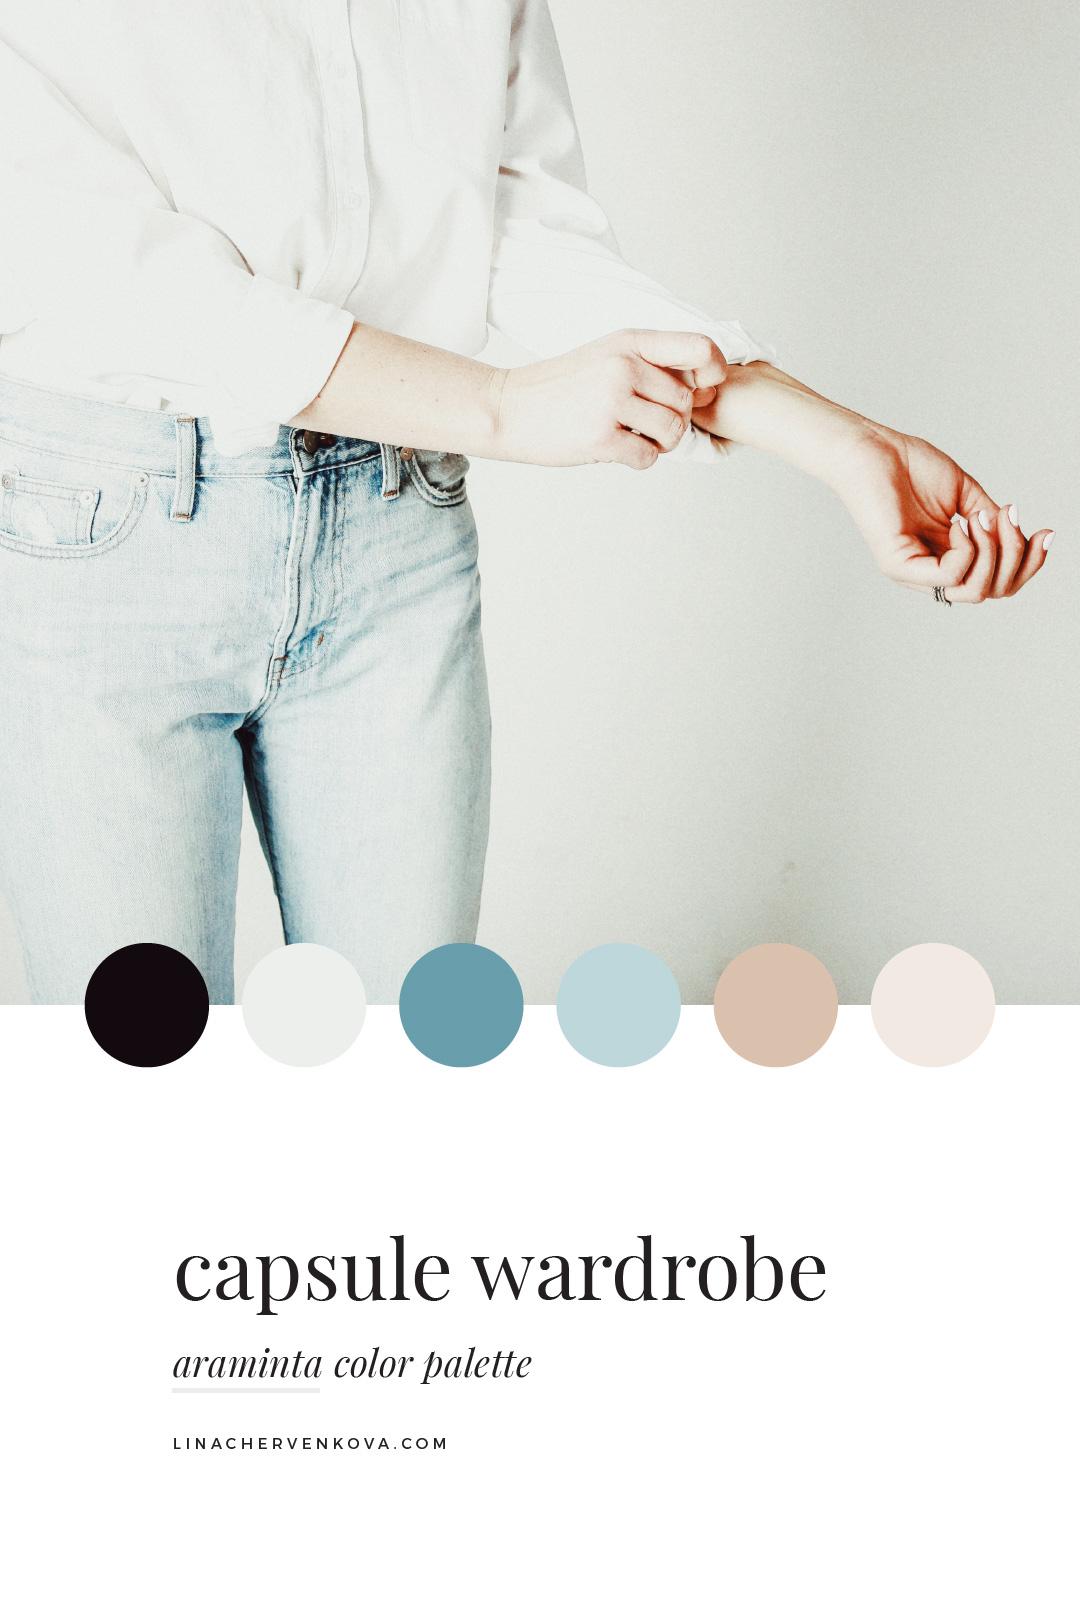 araminta-color-palette-3.jpg